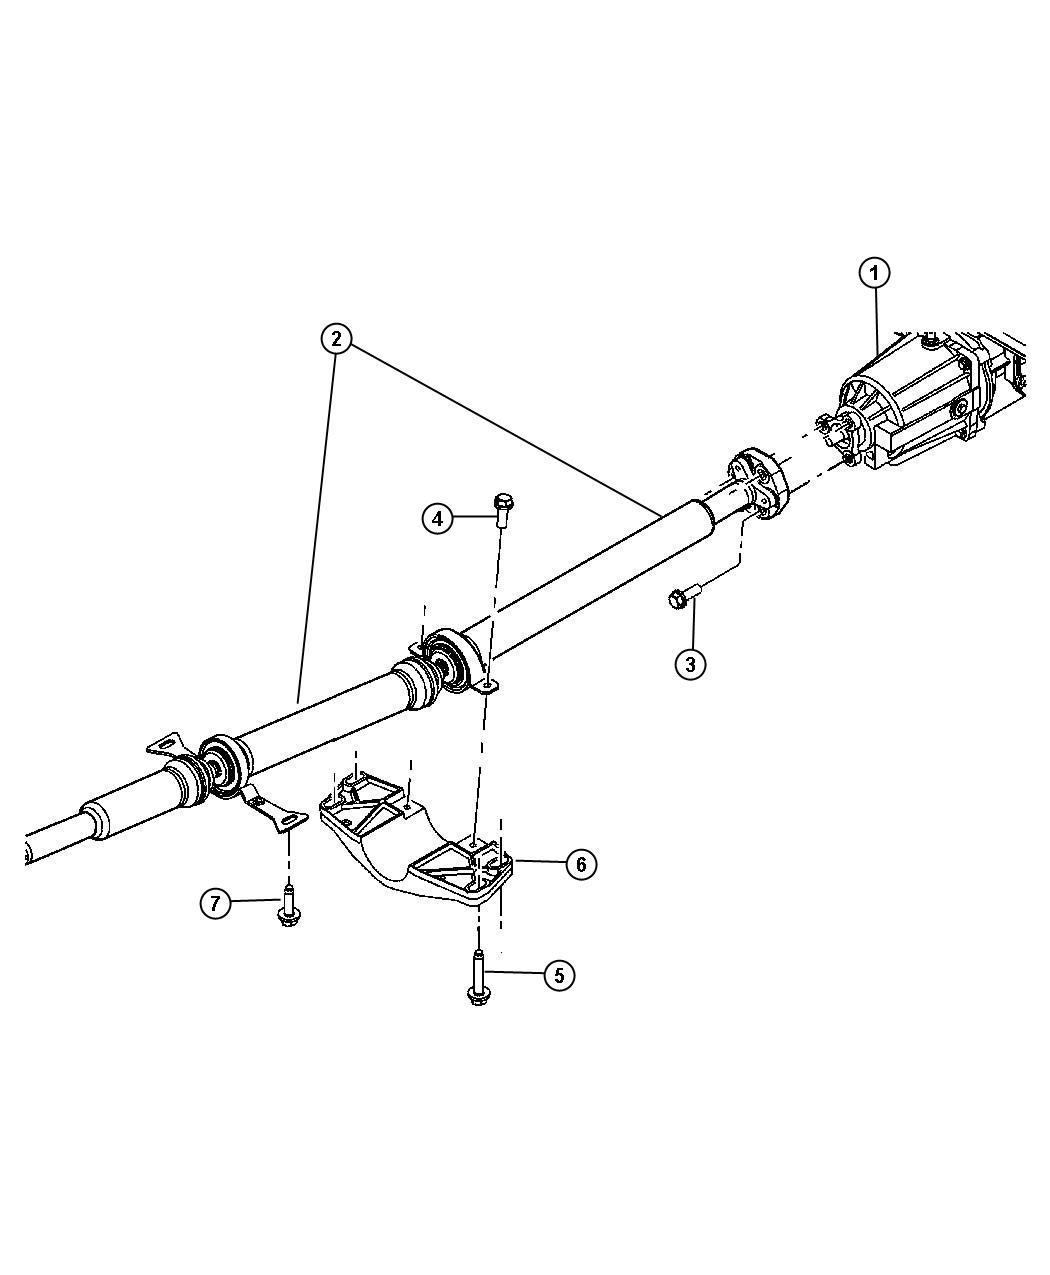 Chrysler Pacifica Shaft  Drive  Propeller  Driveline  Rear